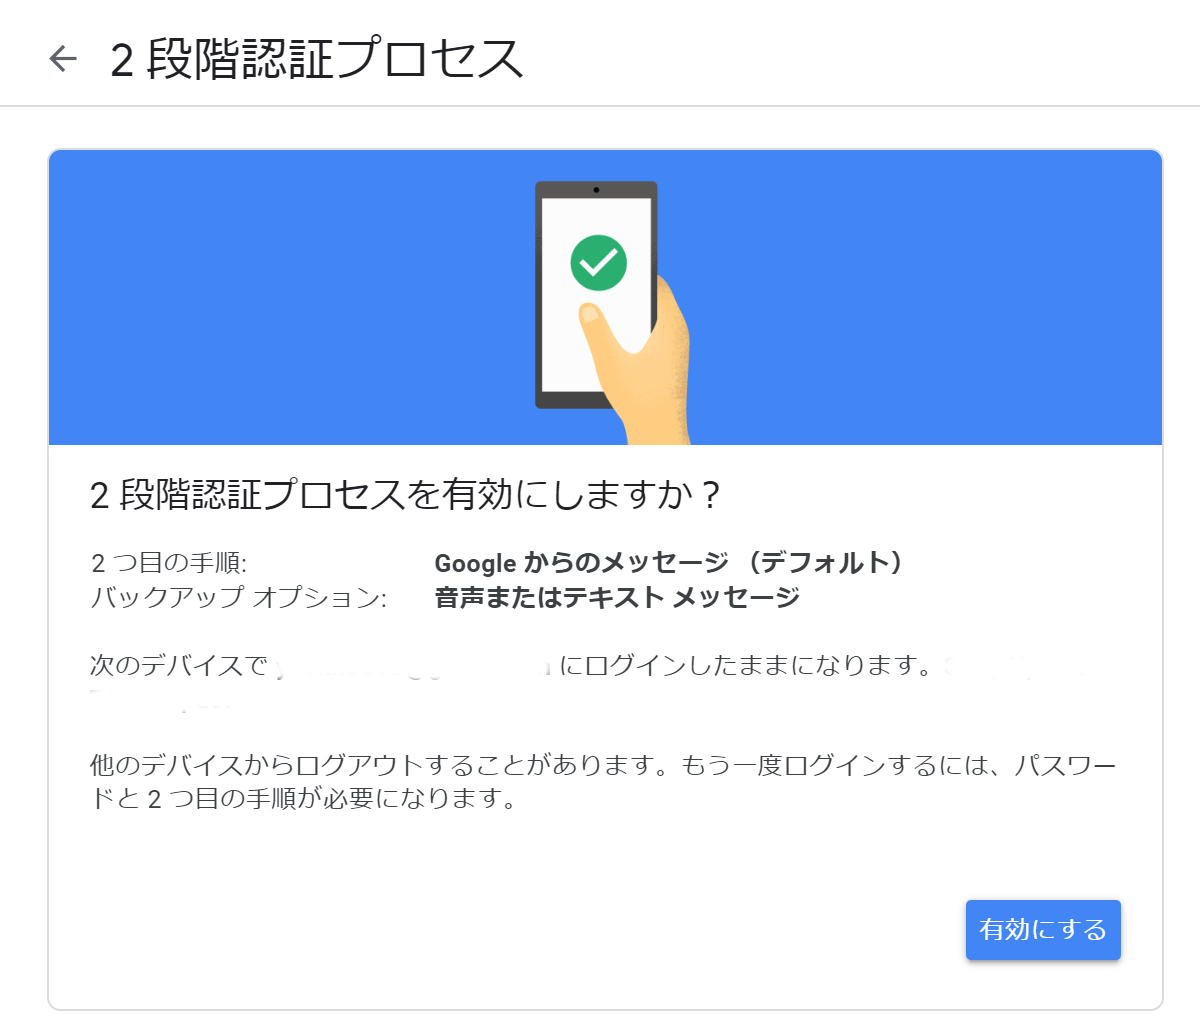 グーグル広告2段階認証有効化